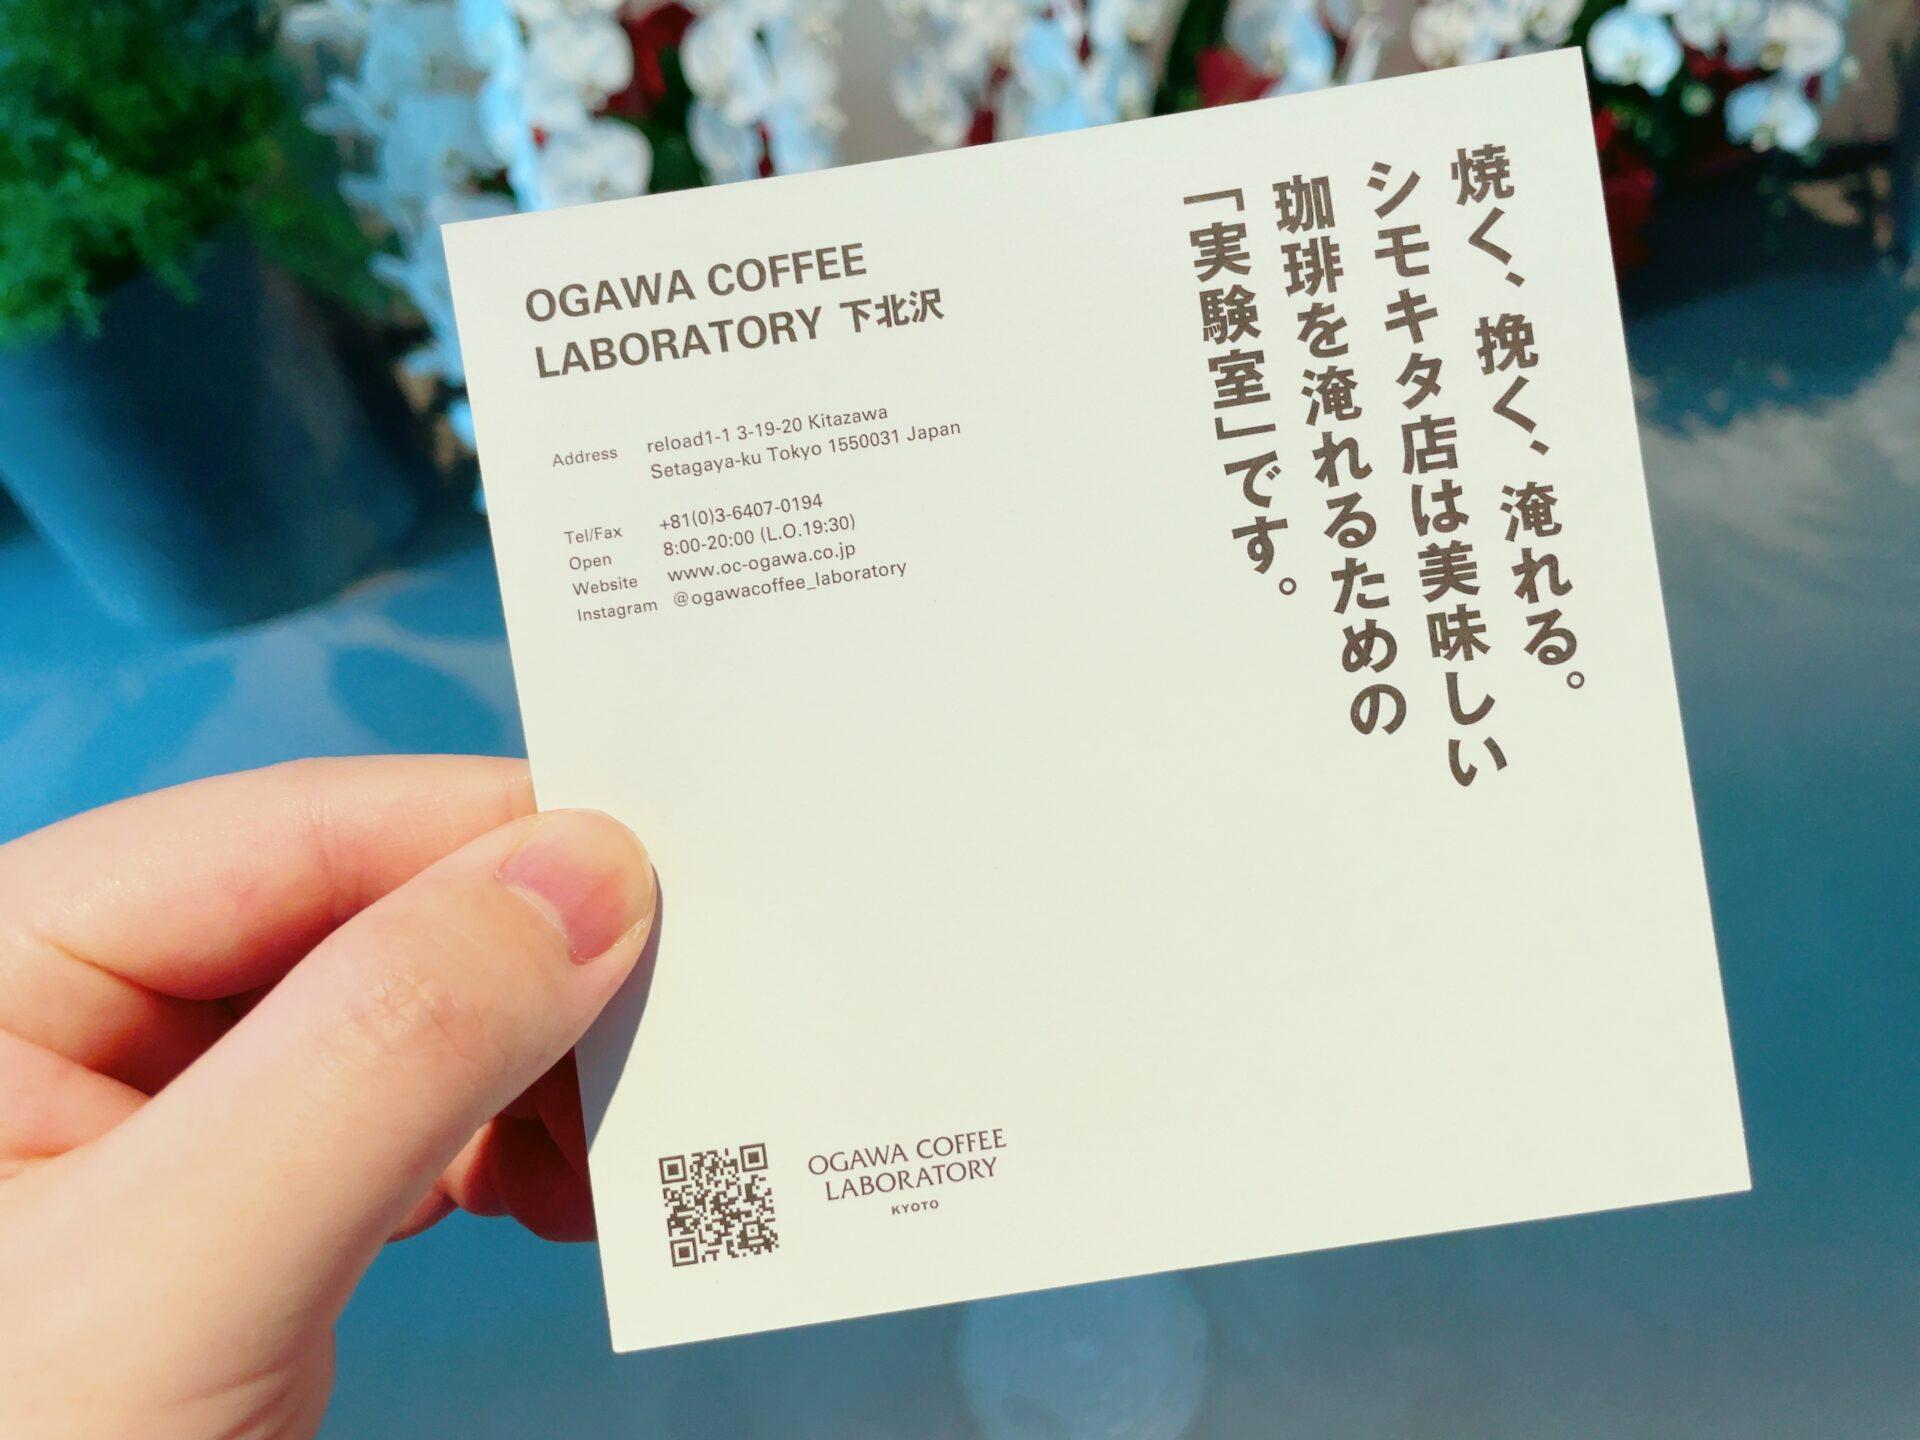 OGAWA COFFEE LABORATORY 下北沢店のショップカード